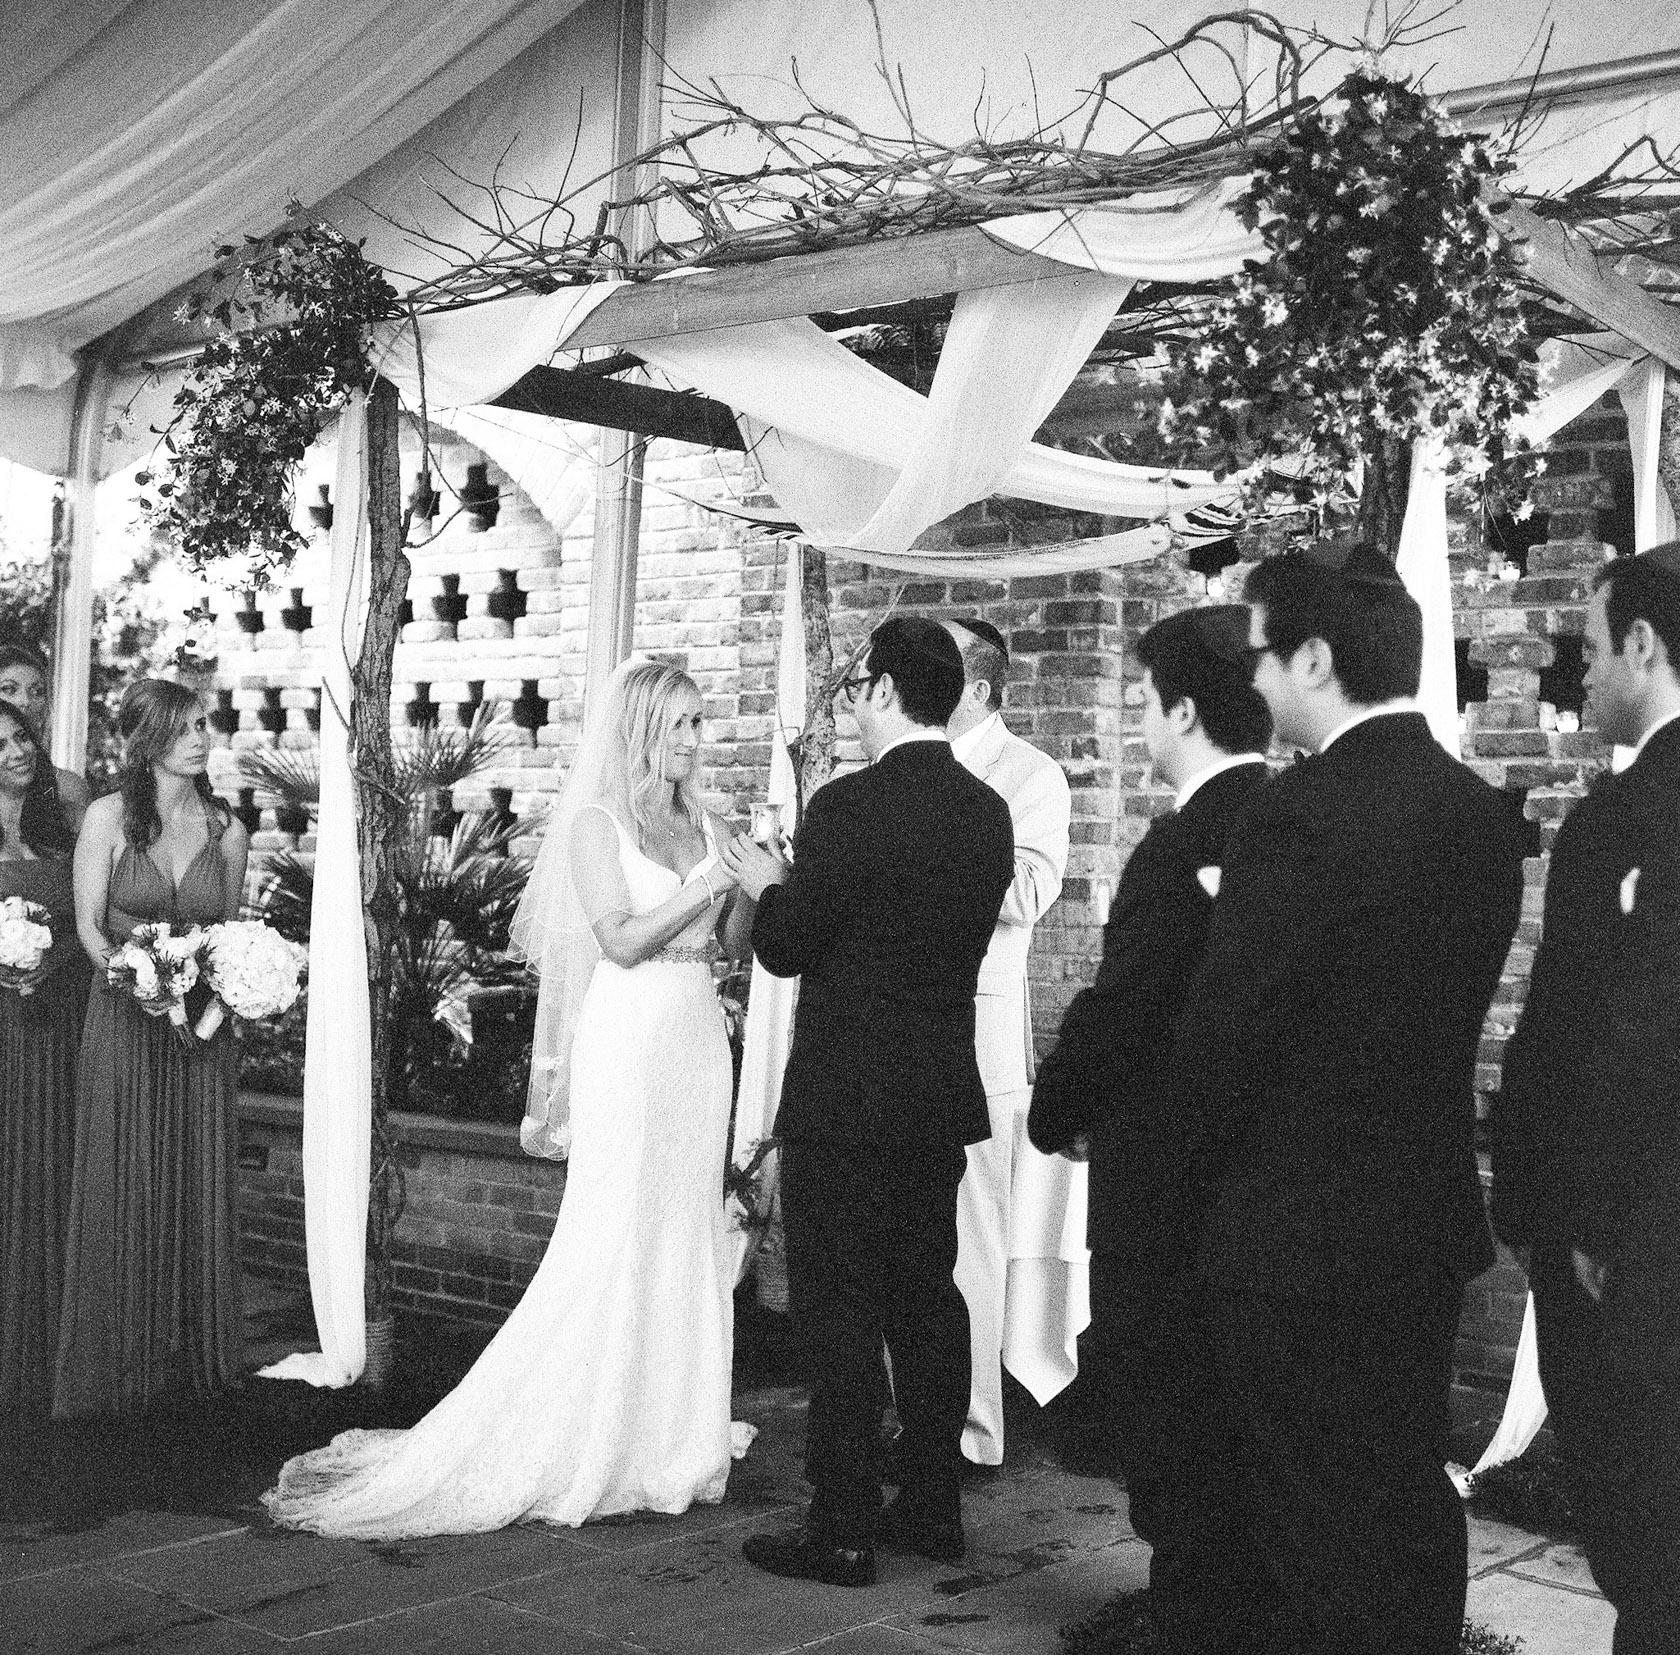 maison dupuy wedding on film 15